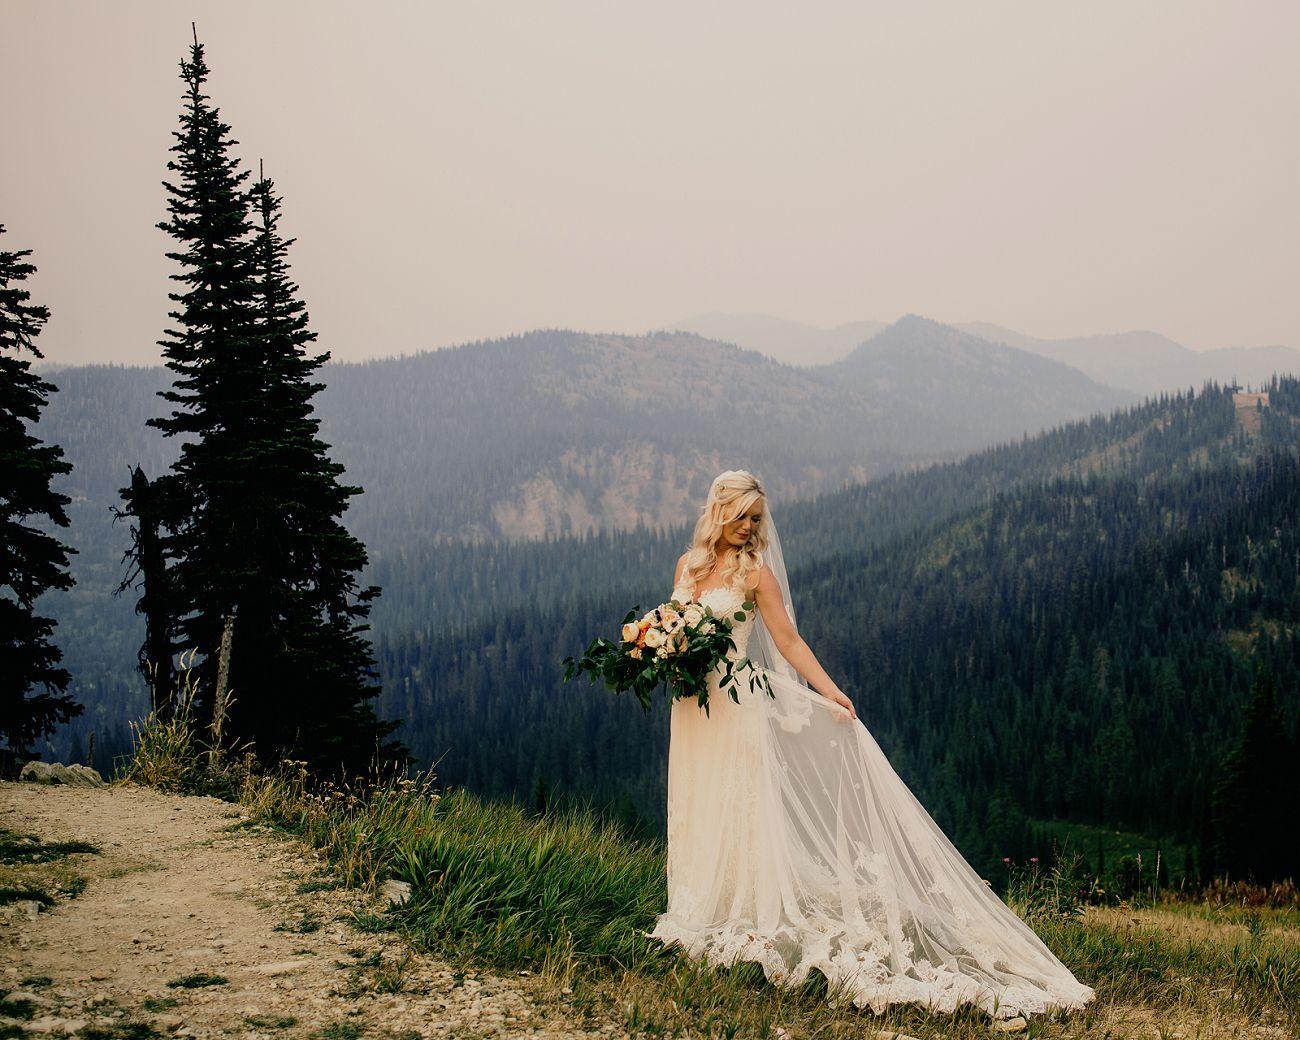 Jennifer_Mooney_Photo_Whitefish_mountain_resort_wedding_elegant_montana_wedding_014.jpg